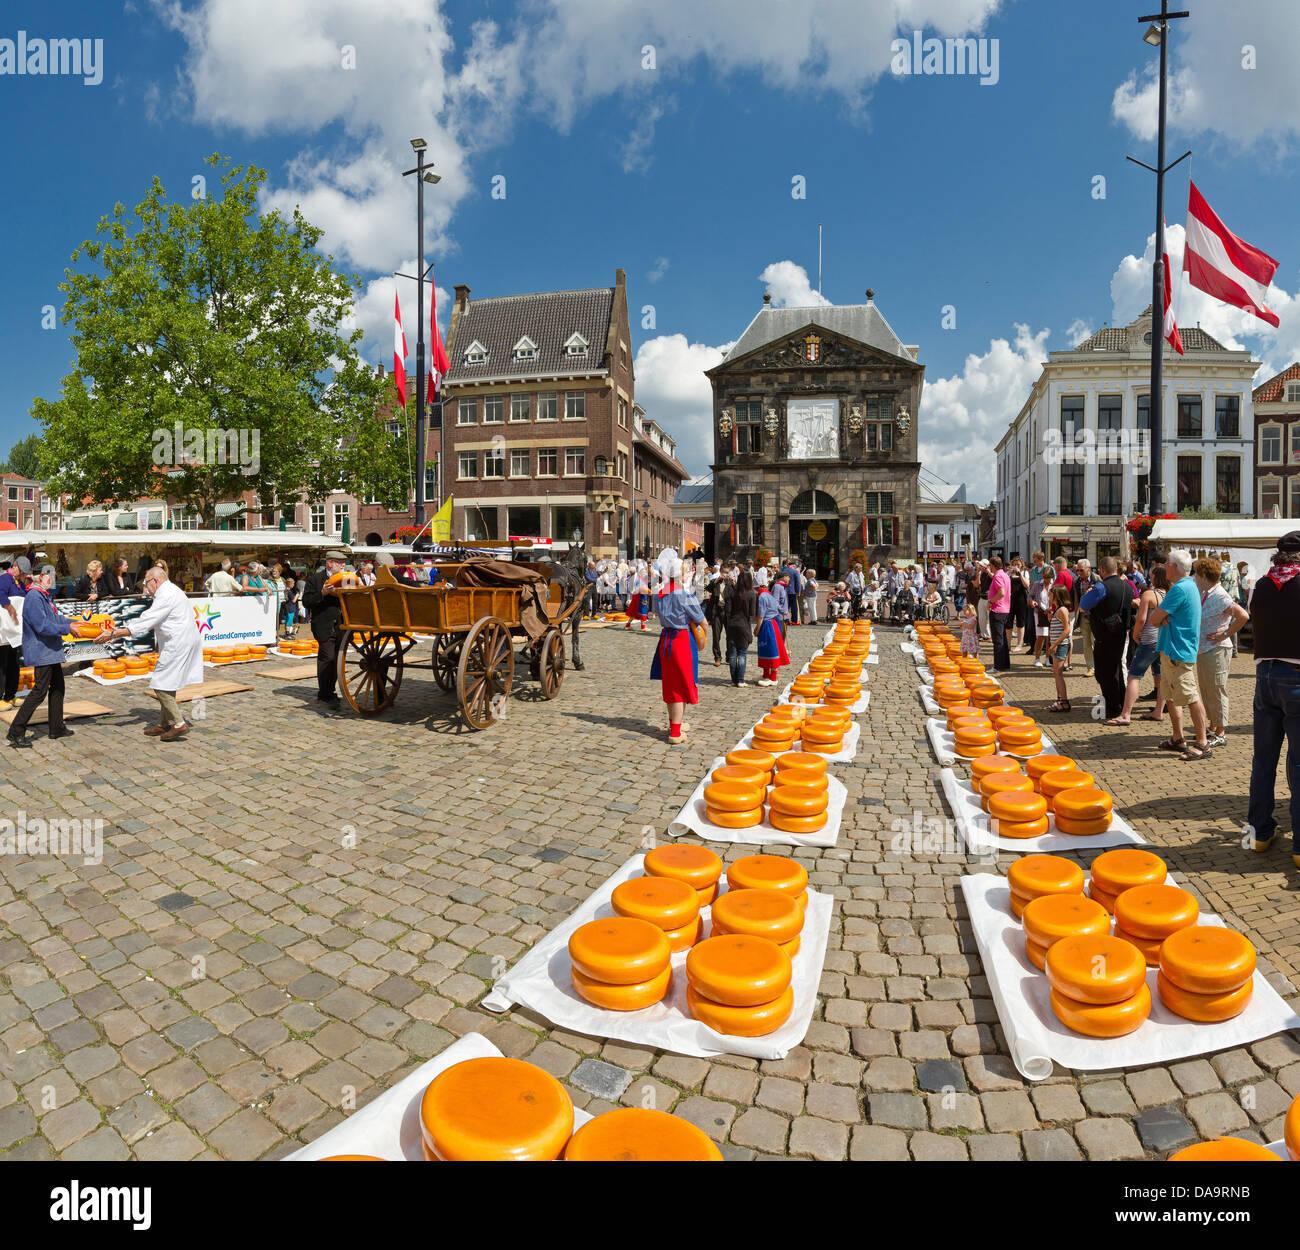 Netherlands Holland Europe Gouda Cheese Tradition Market City Village St Nicholas Day